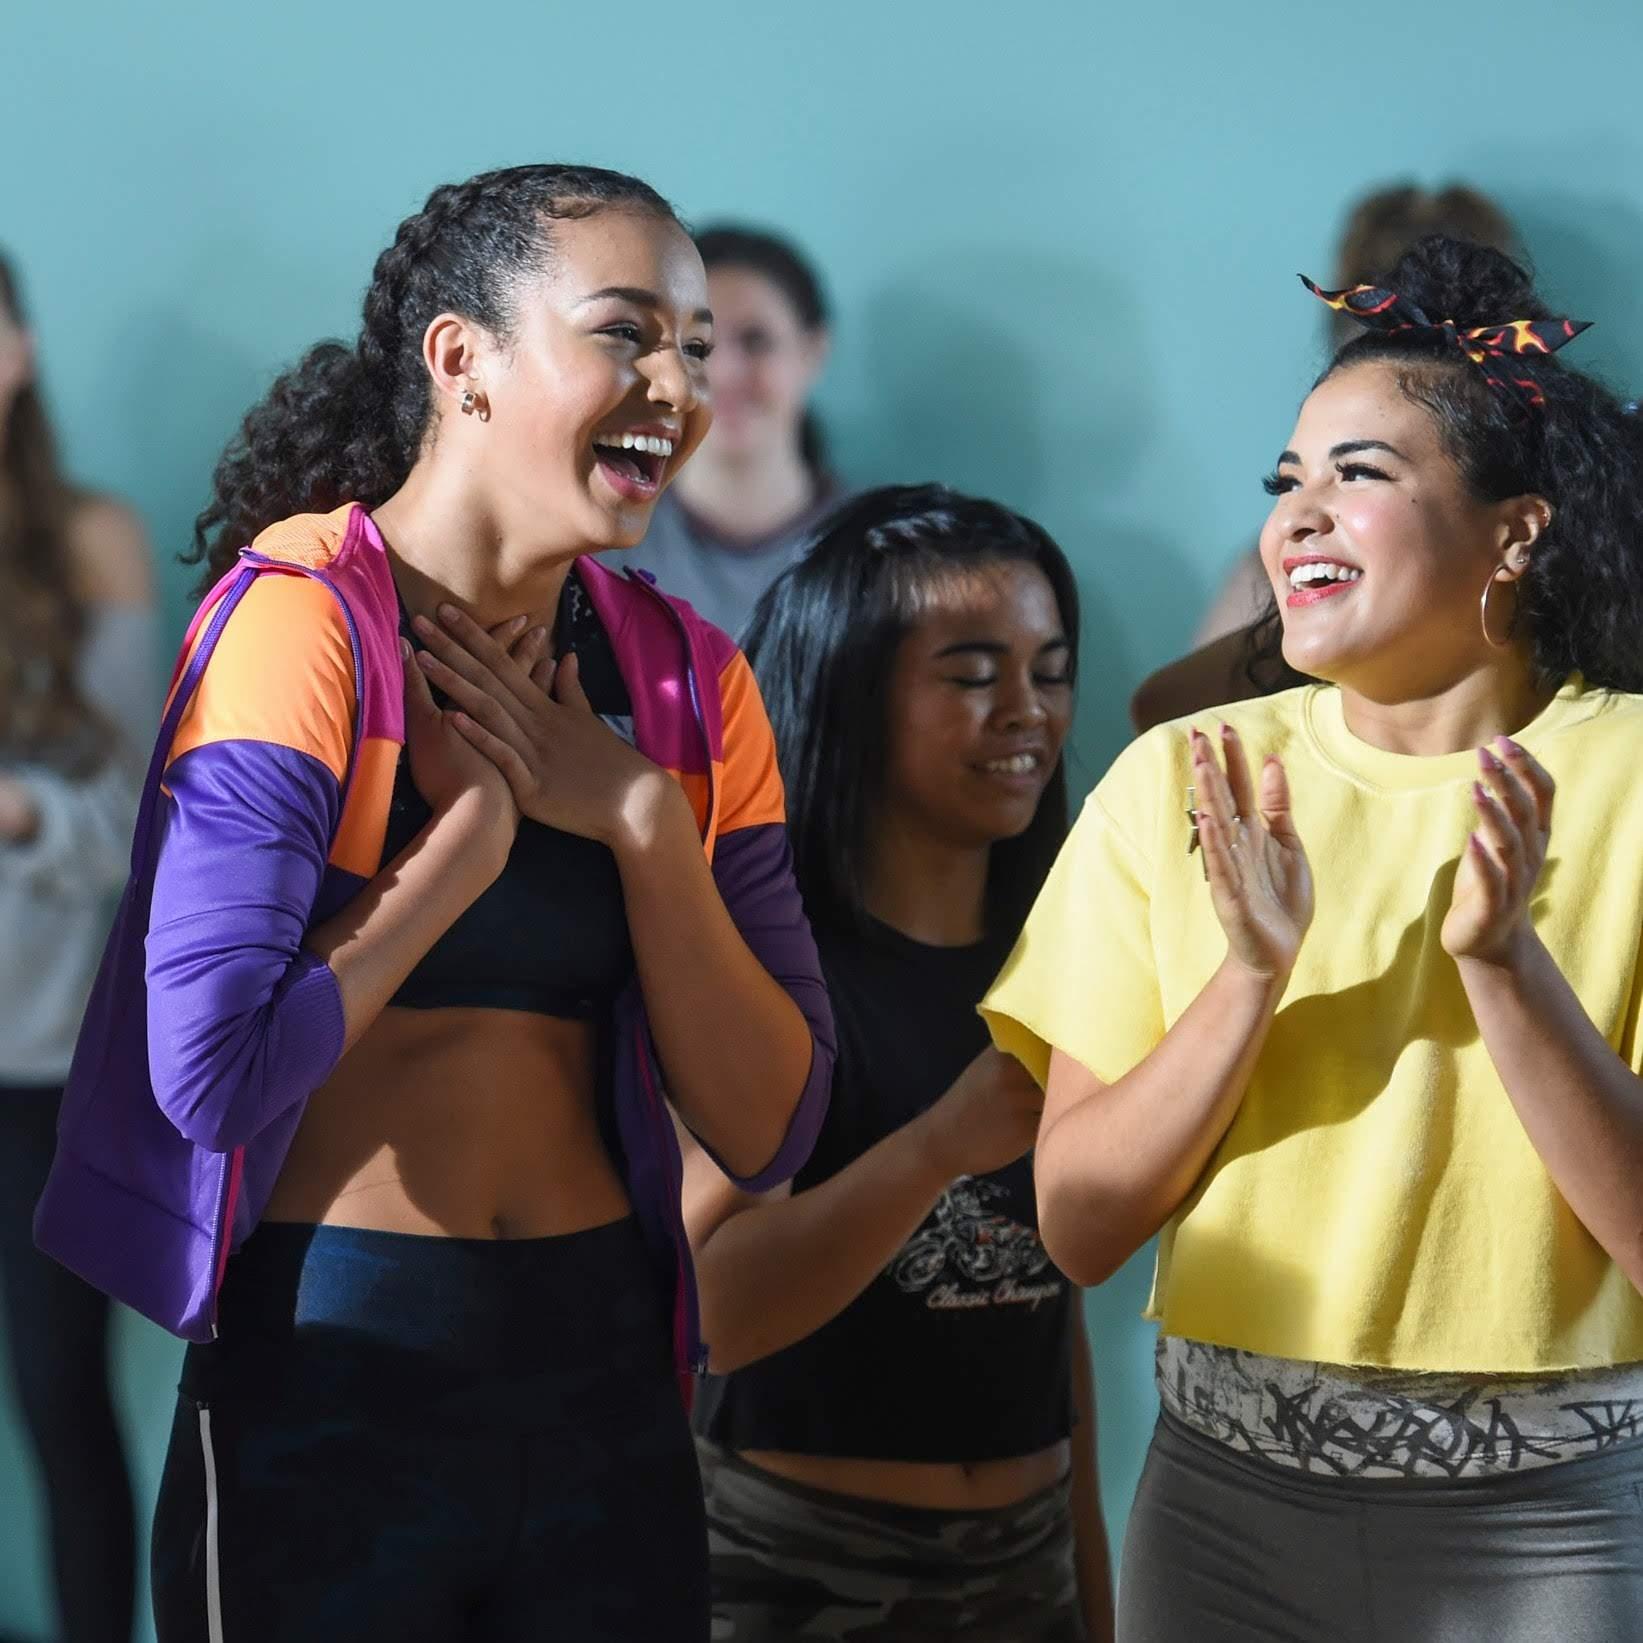 High School Musical The Musical The Series : あの「ハイスクール・ミュージカル」を復活させる高校生たちの青春を描く Disney+ の配信シリーズ「ハイスクール・ミュージカル・ザ・ミュージカル・ザ・シリーズ」の予告編を初公開 ! !